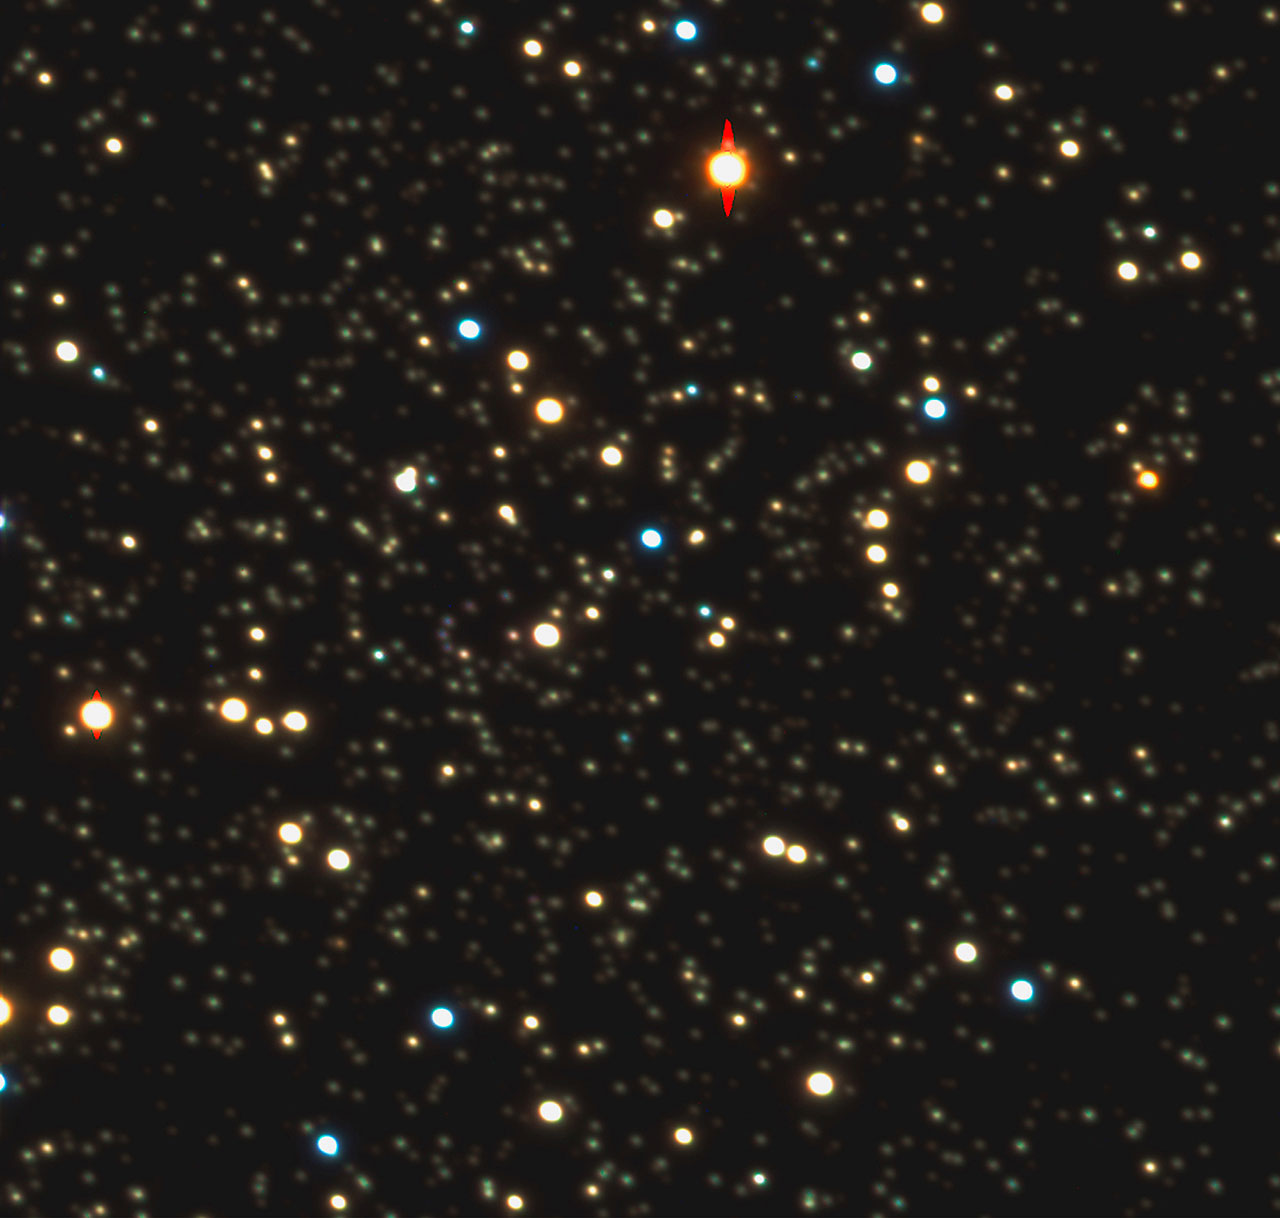 The Central Region of Globular Cluster Messier 4